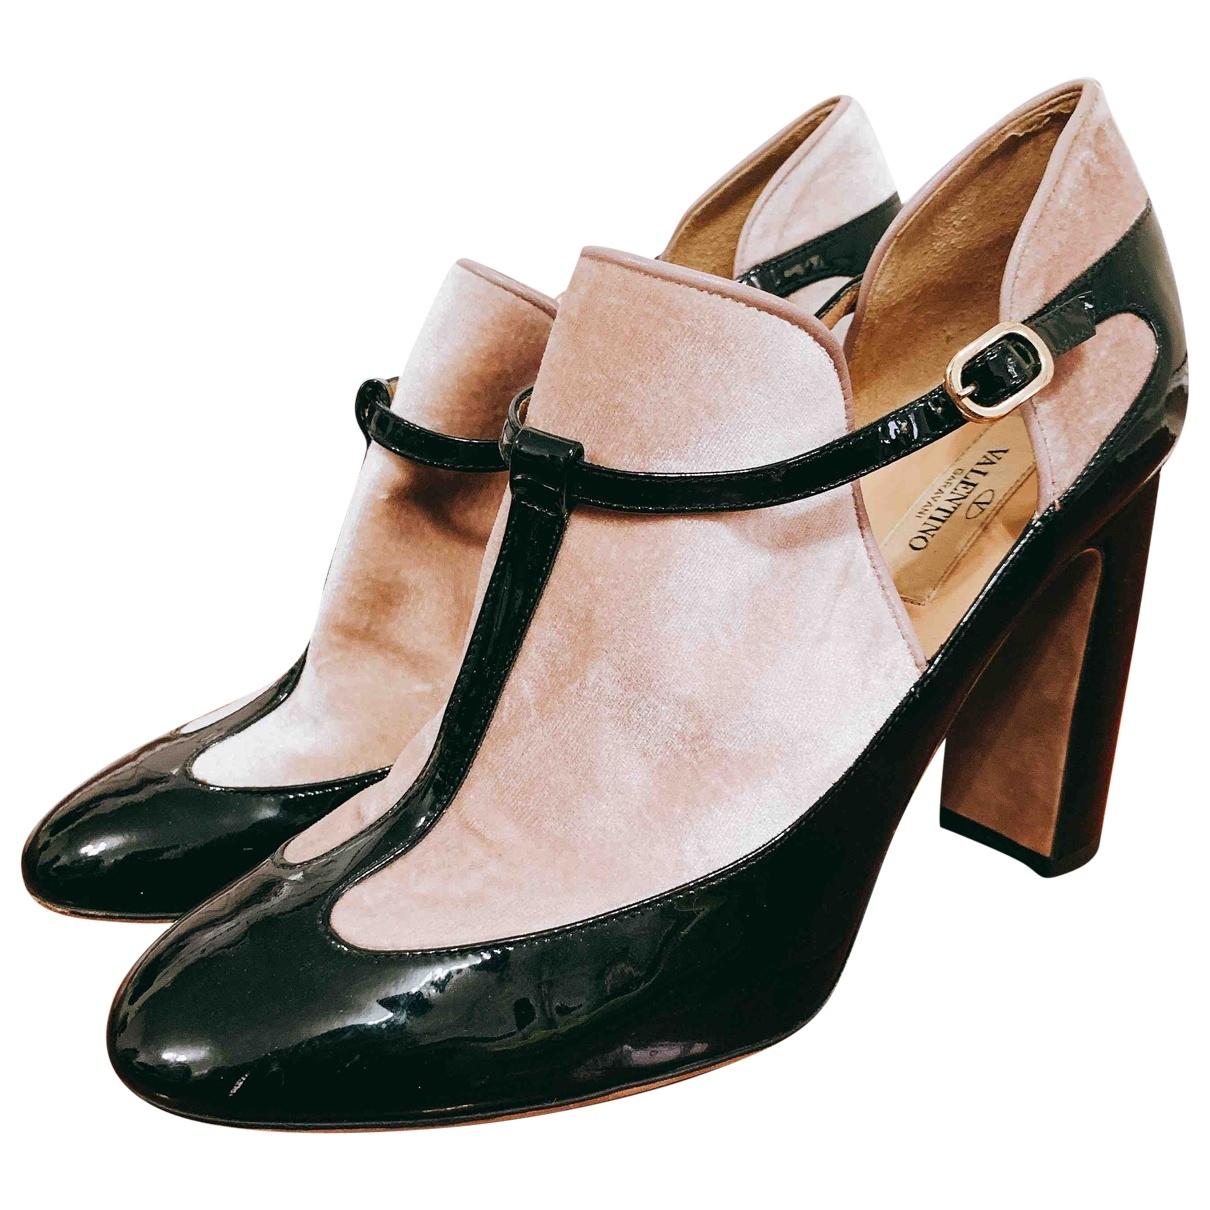 Valentino Garavani \N Black Patent leather Heels for Women 39 EU